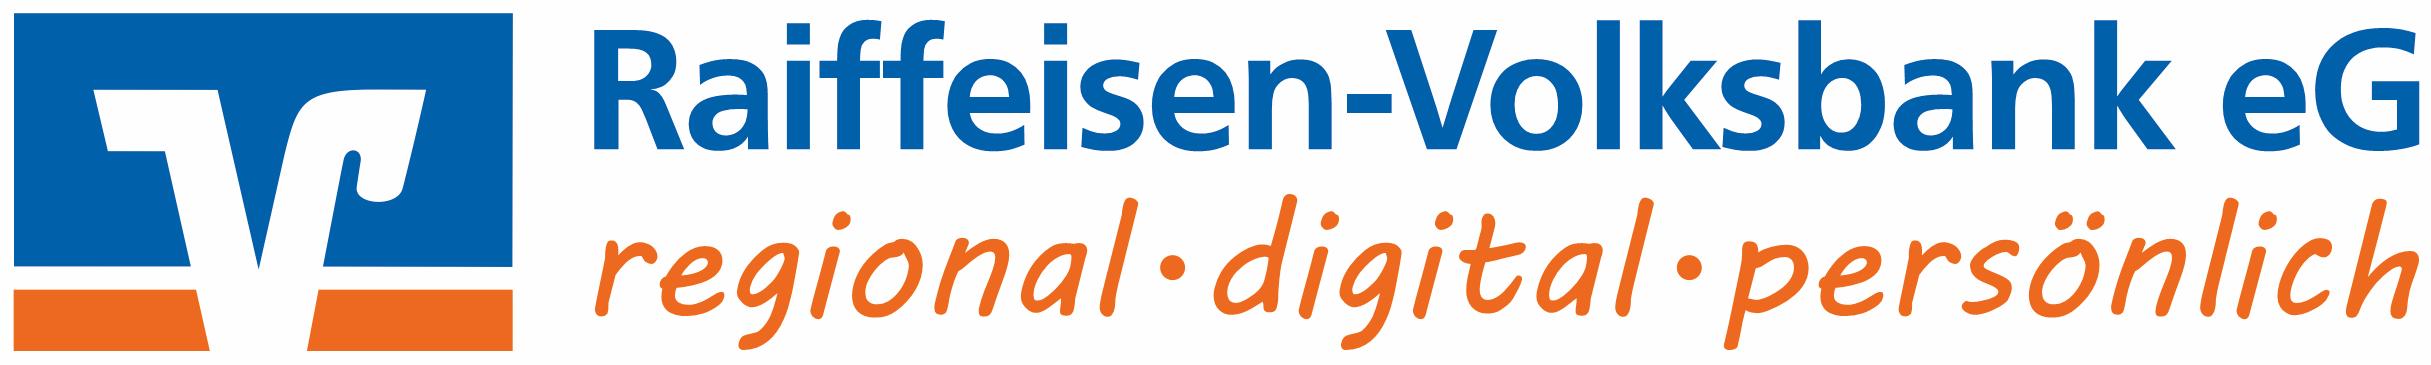 Raiffeisen-Volksbank eG